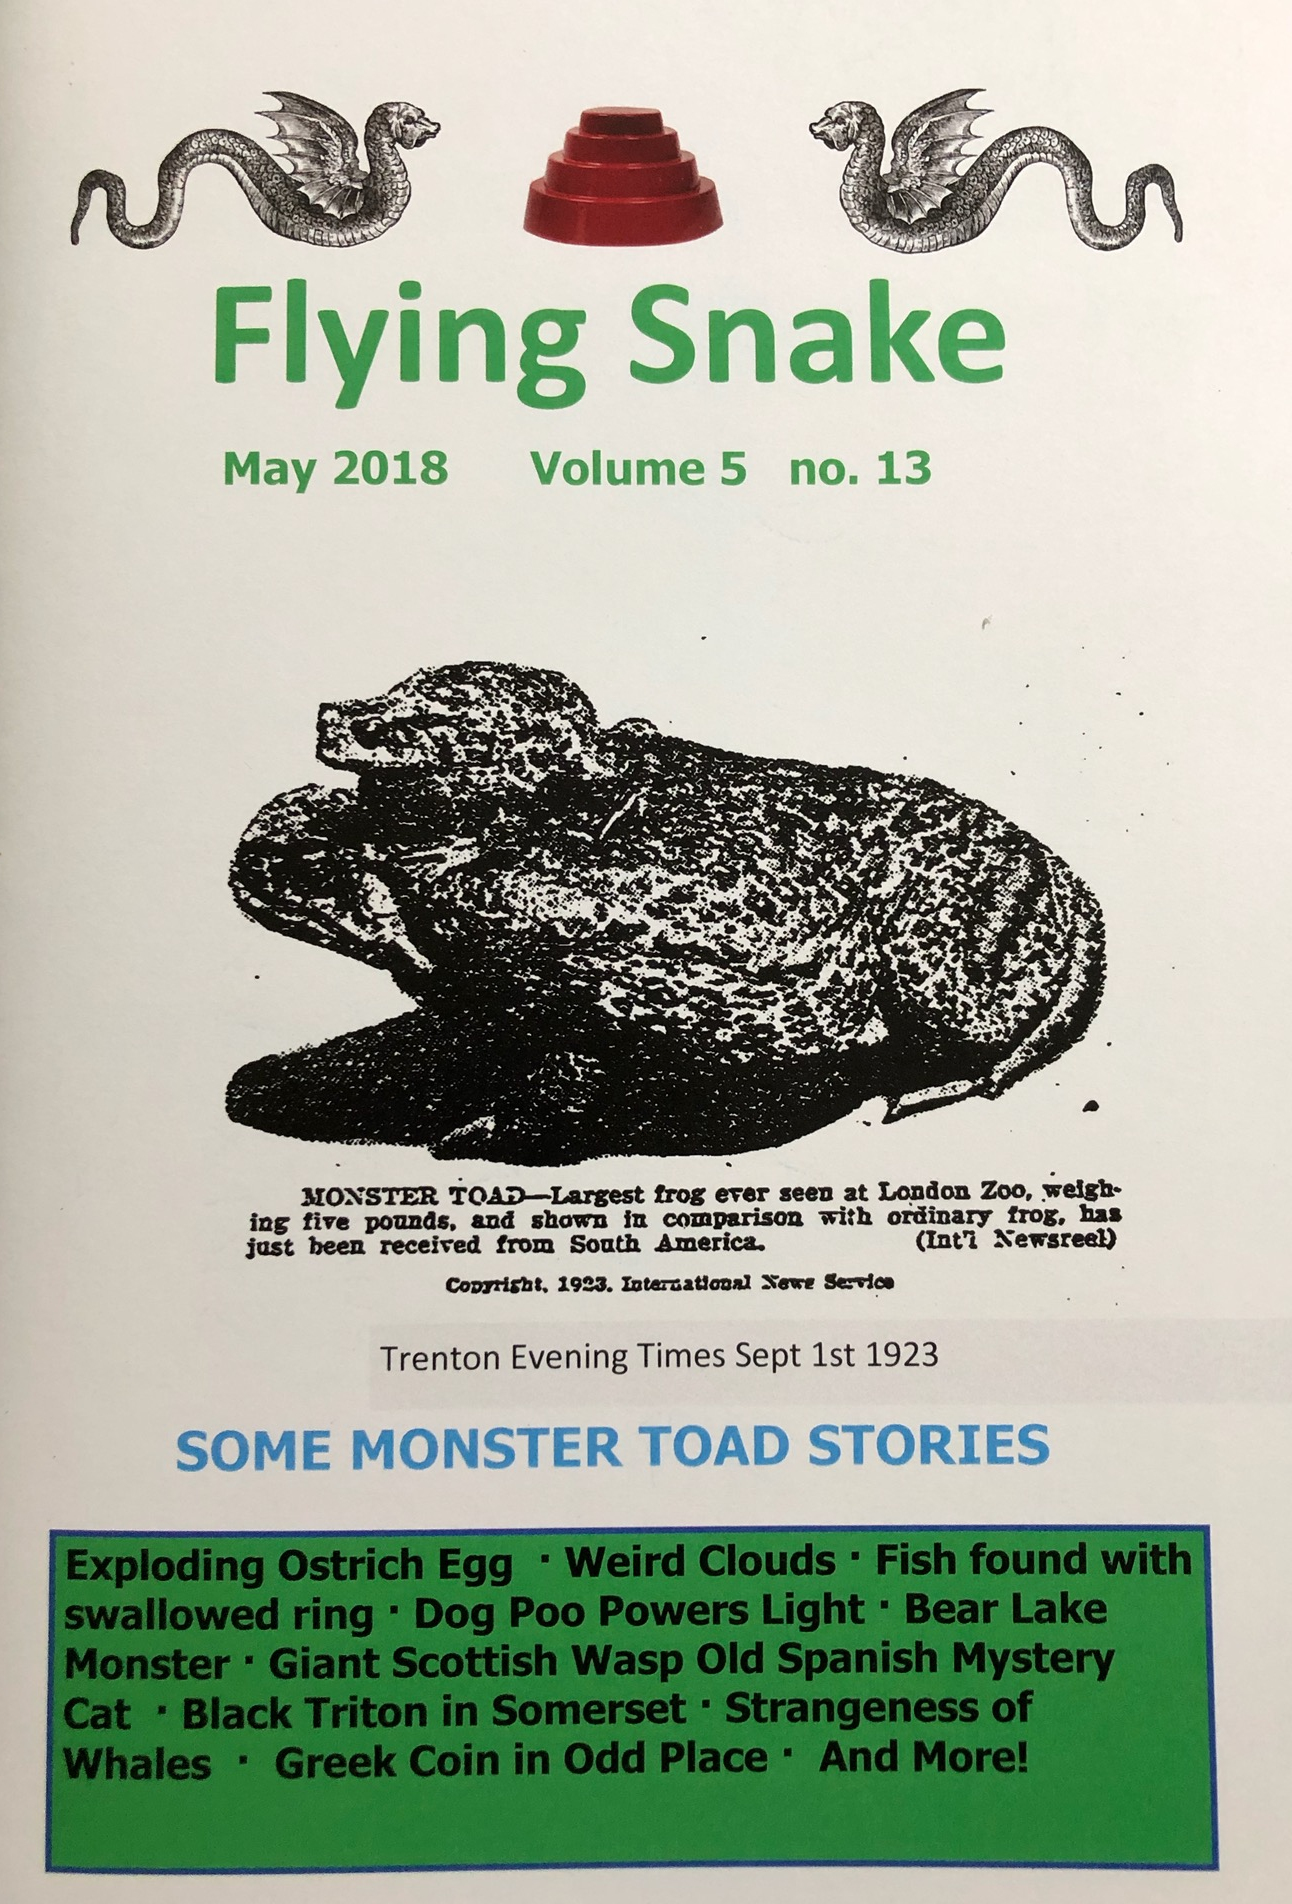 Flying Snake Vol. 5 #13